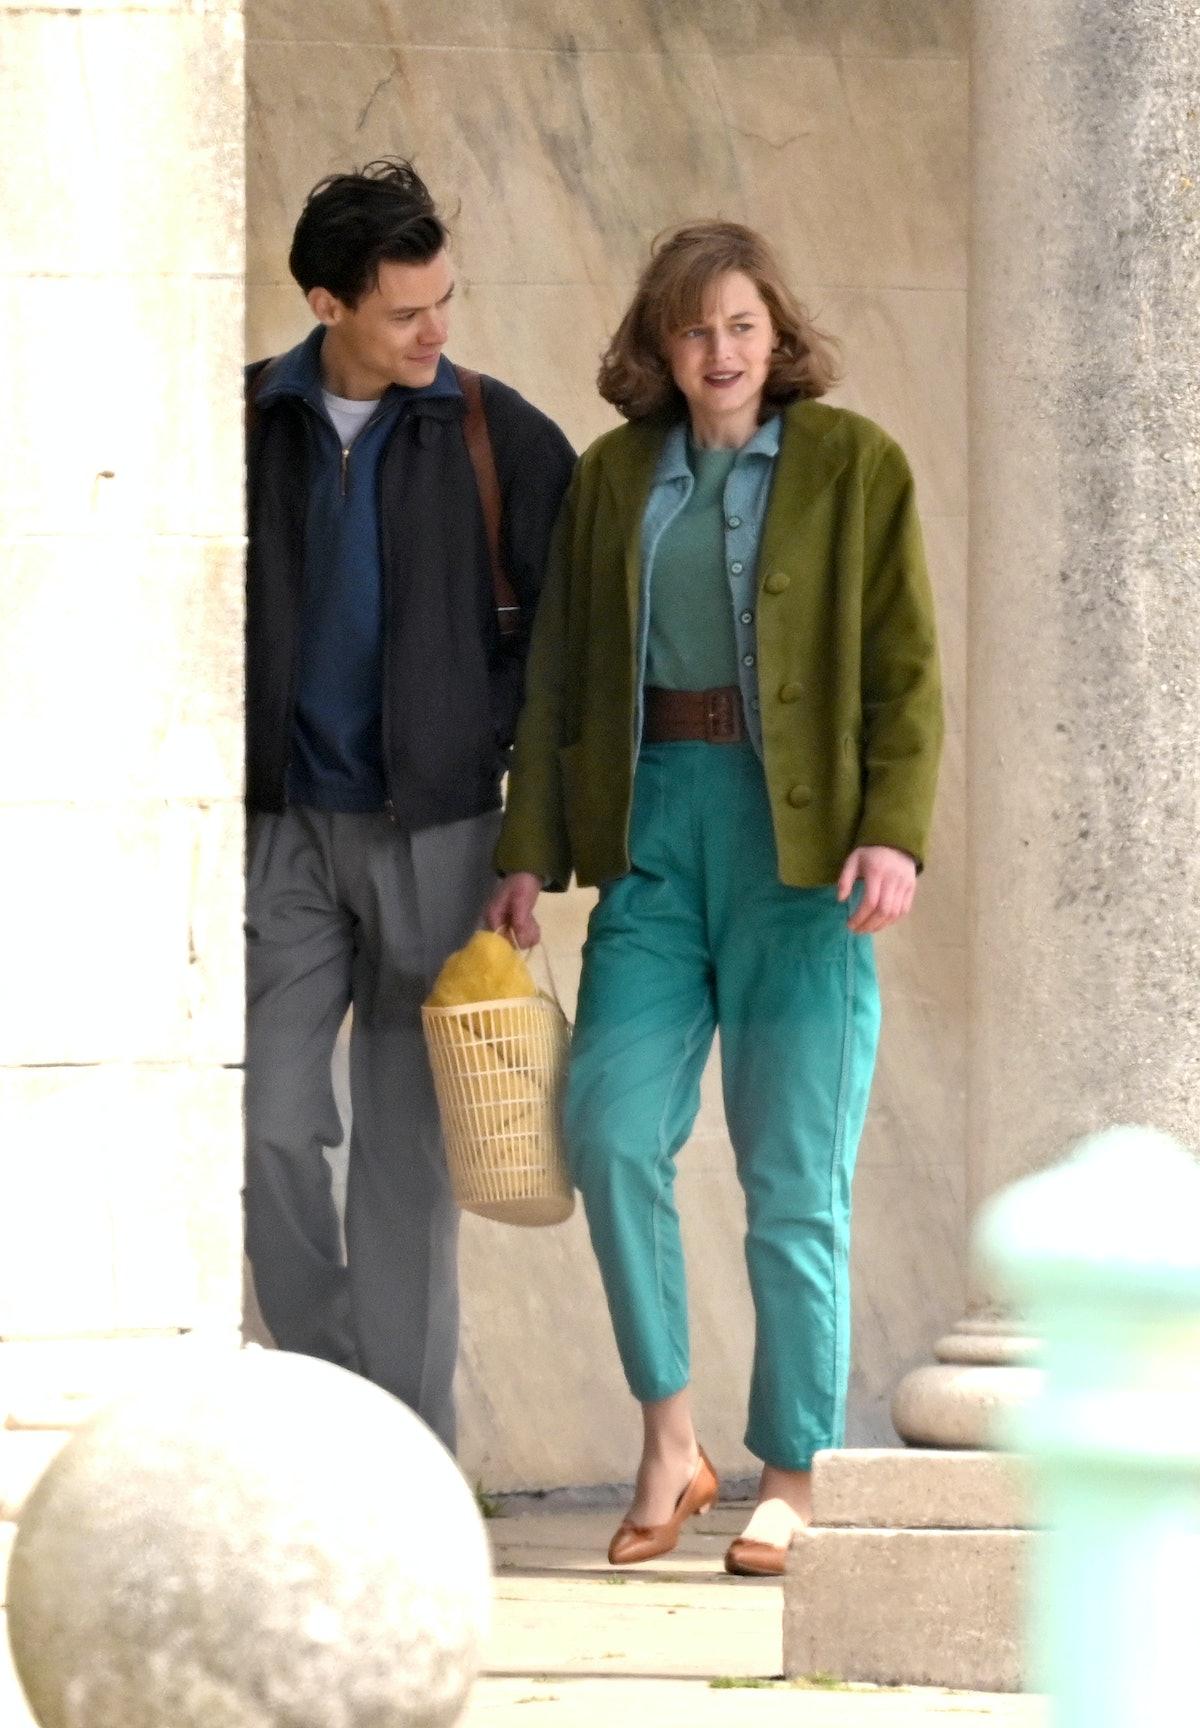 Harry Styles and Emma Corrin walking